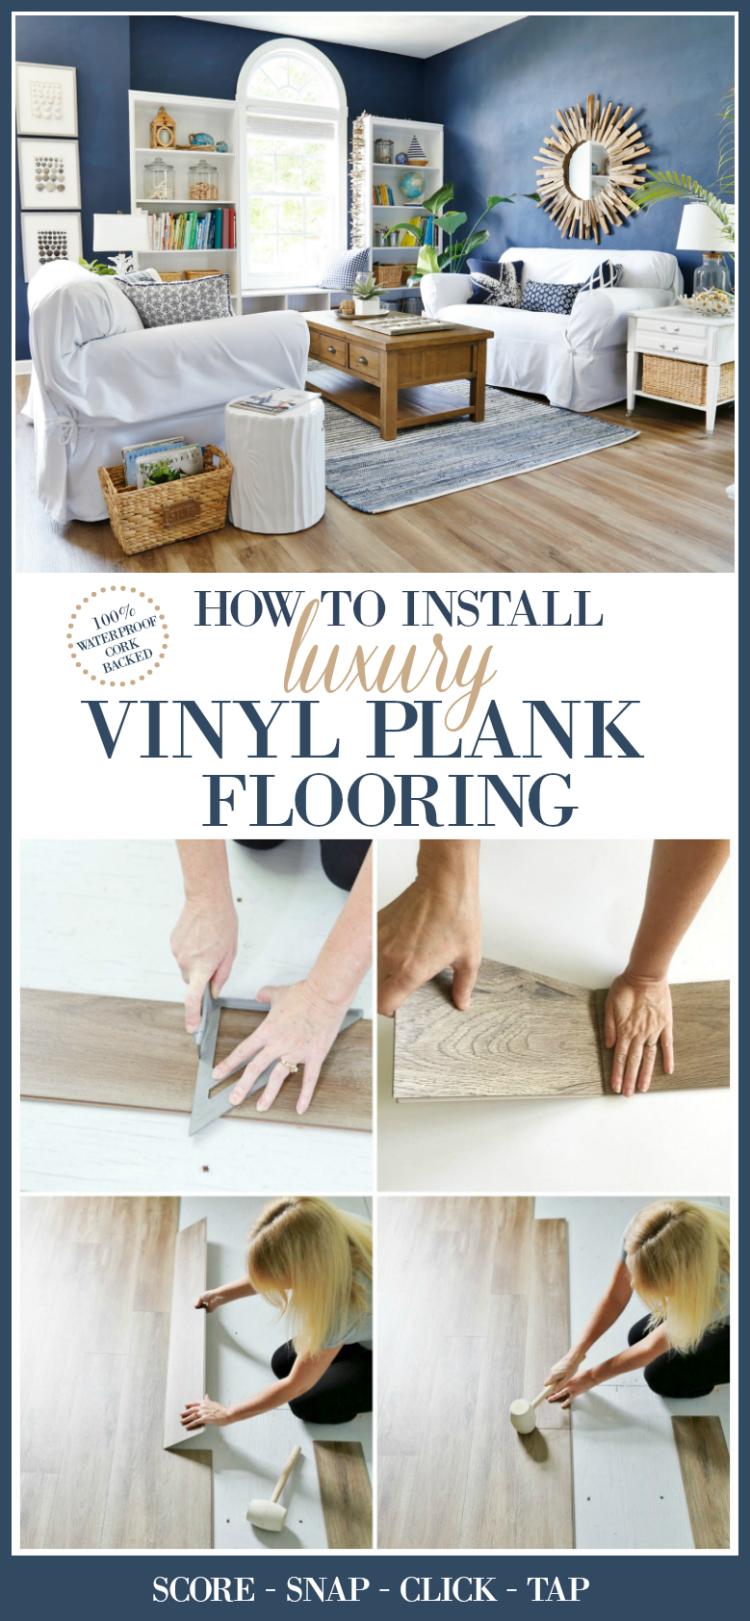 How To Install Luxury Vinyl Plank Flooring Installing